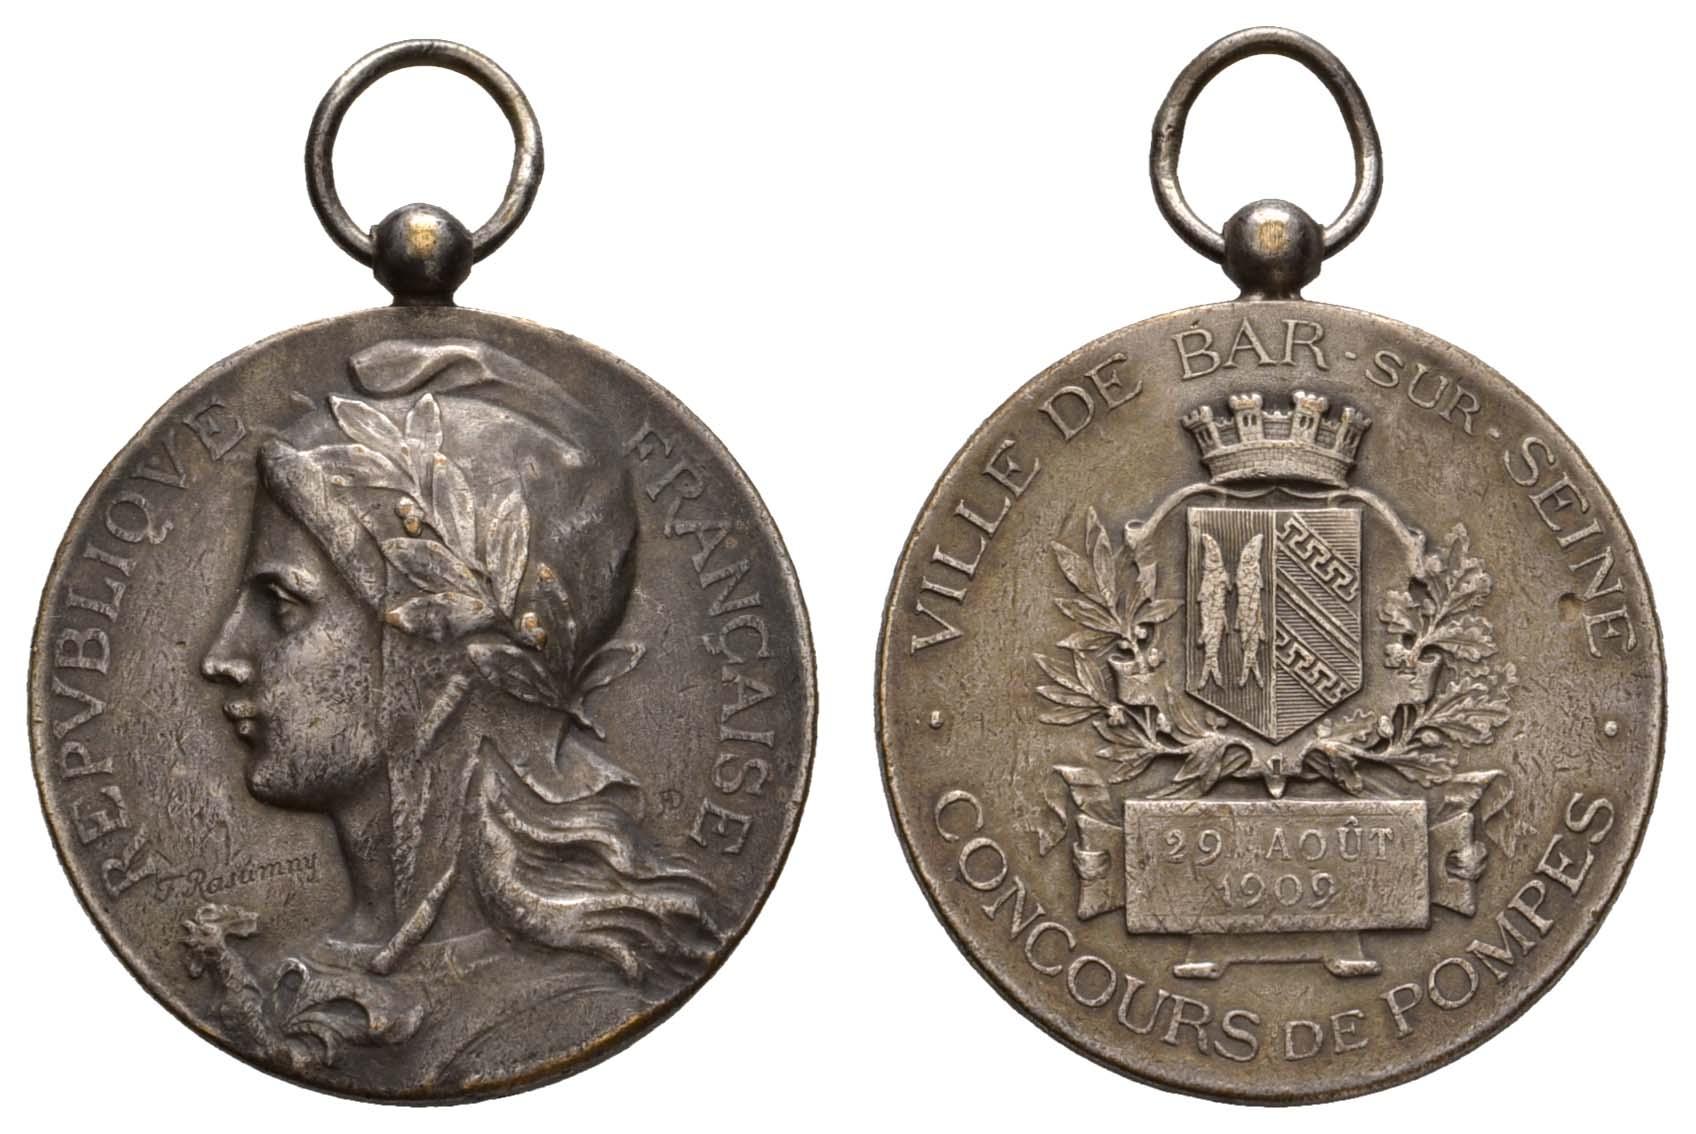 Lot 2269 - medaillen Sonstige Medaillen - Europa -  Auktionshaus Ulrich Felzmann GmbH & Co. KG Coins single lots